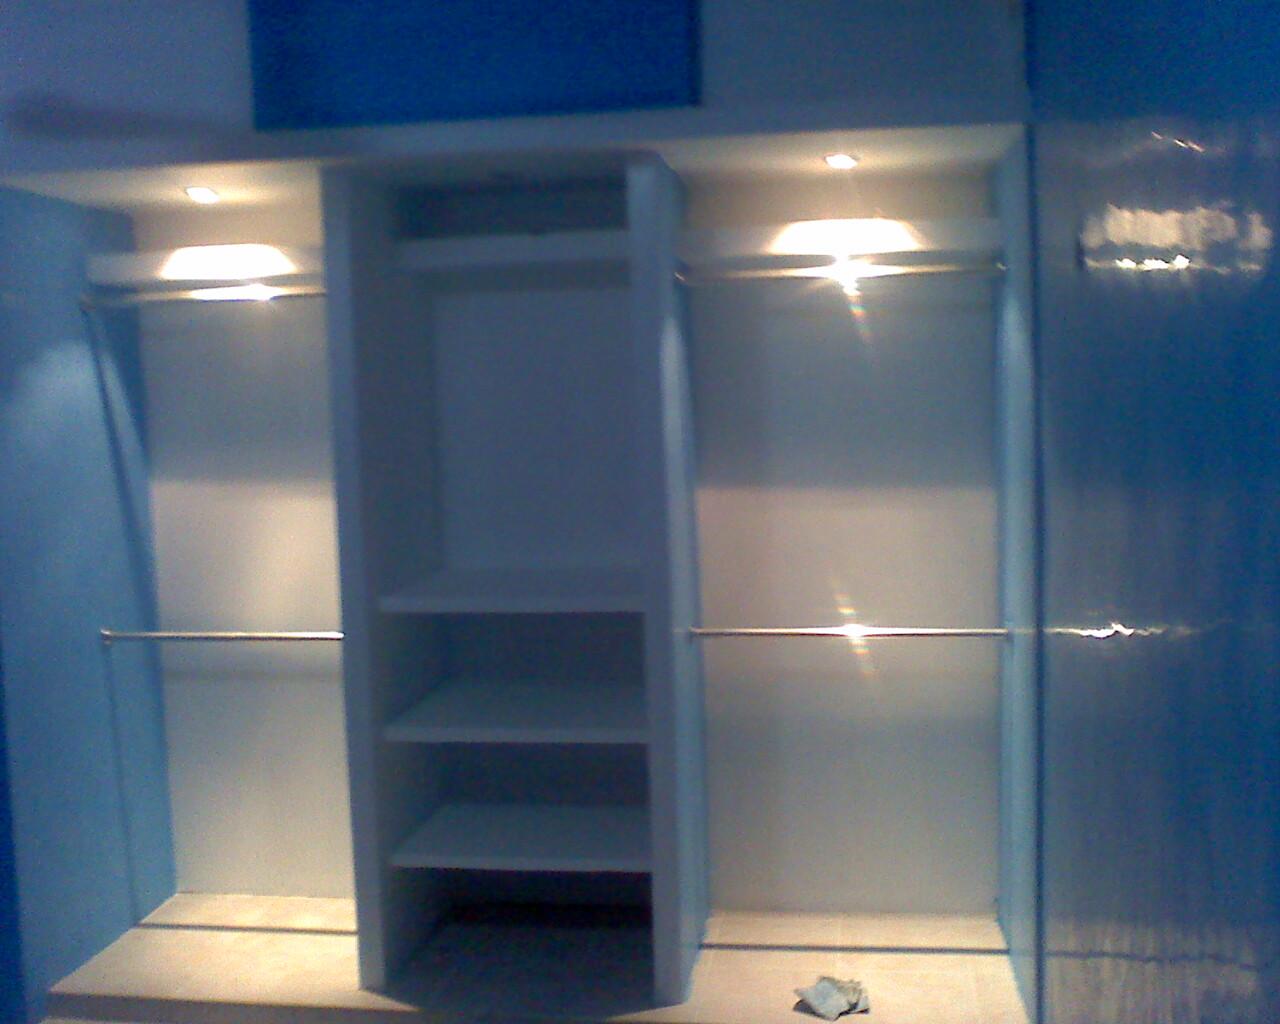 Dcourt decora for Modelos de closet para habitaciones en cemento